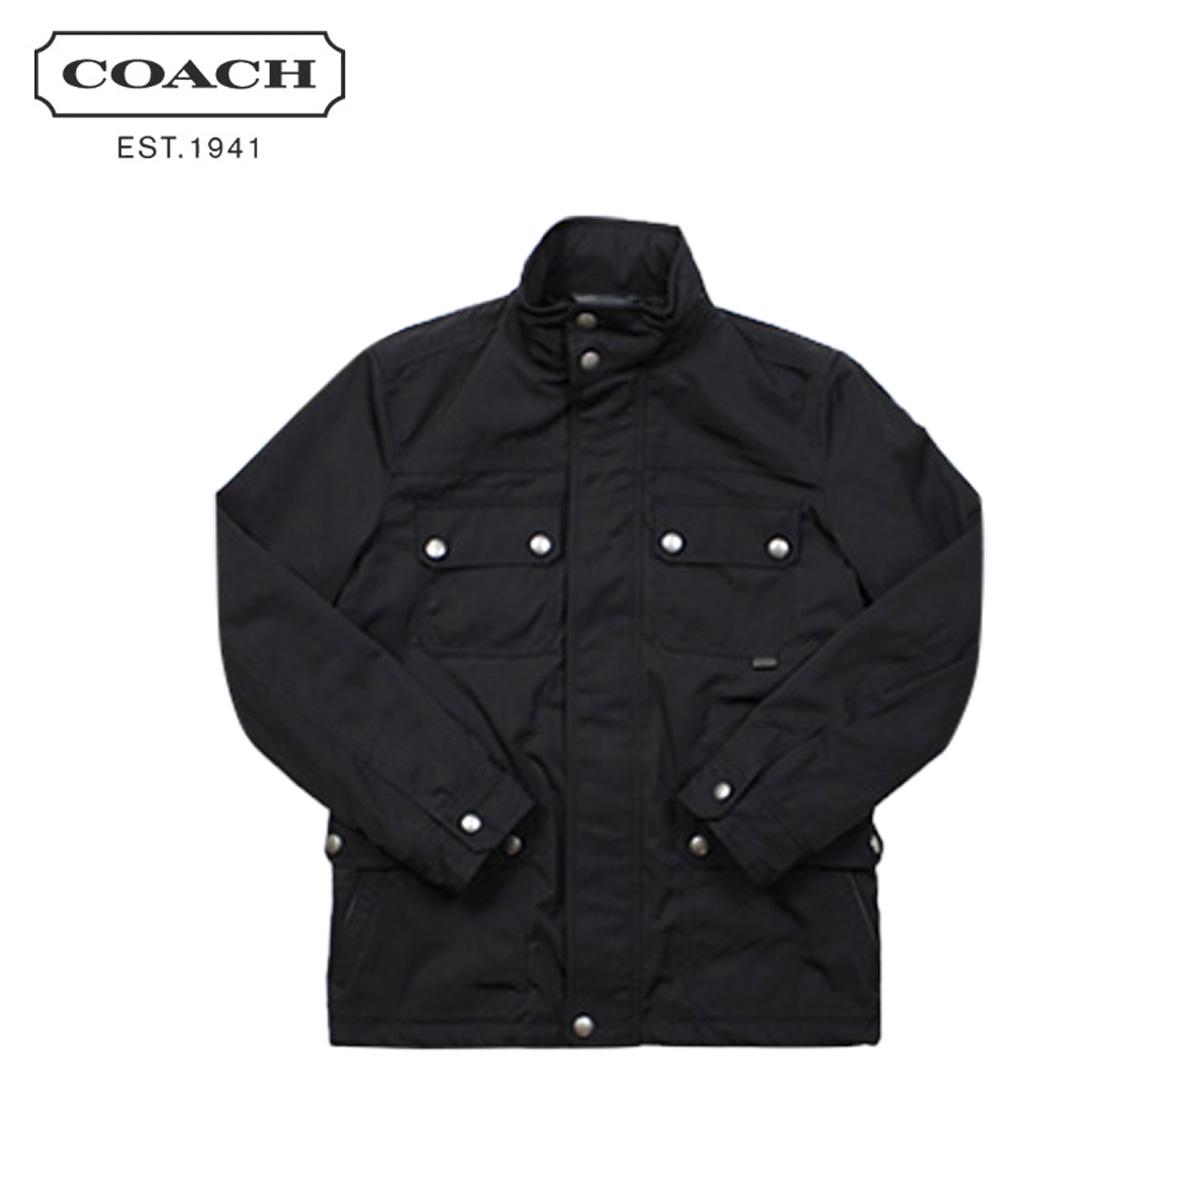 COACH コーチ メンズ ジャケット ブルゾン F82712 ネイビー